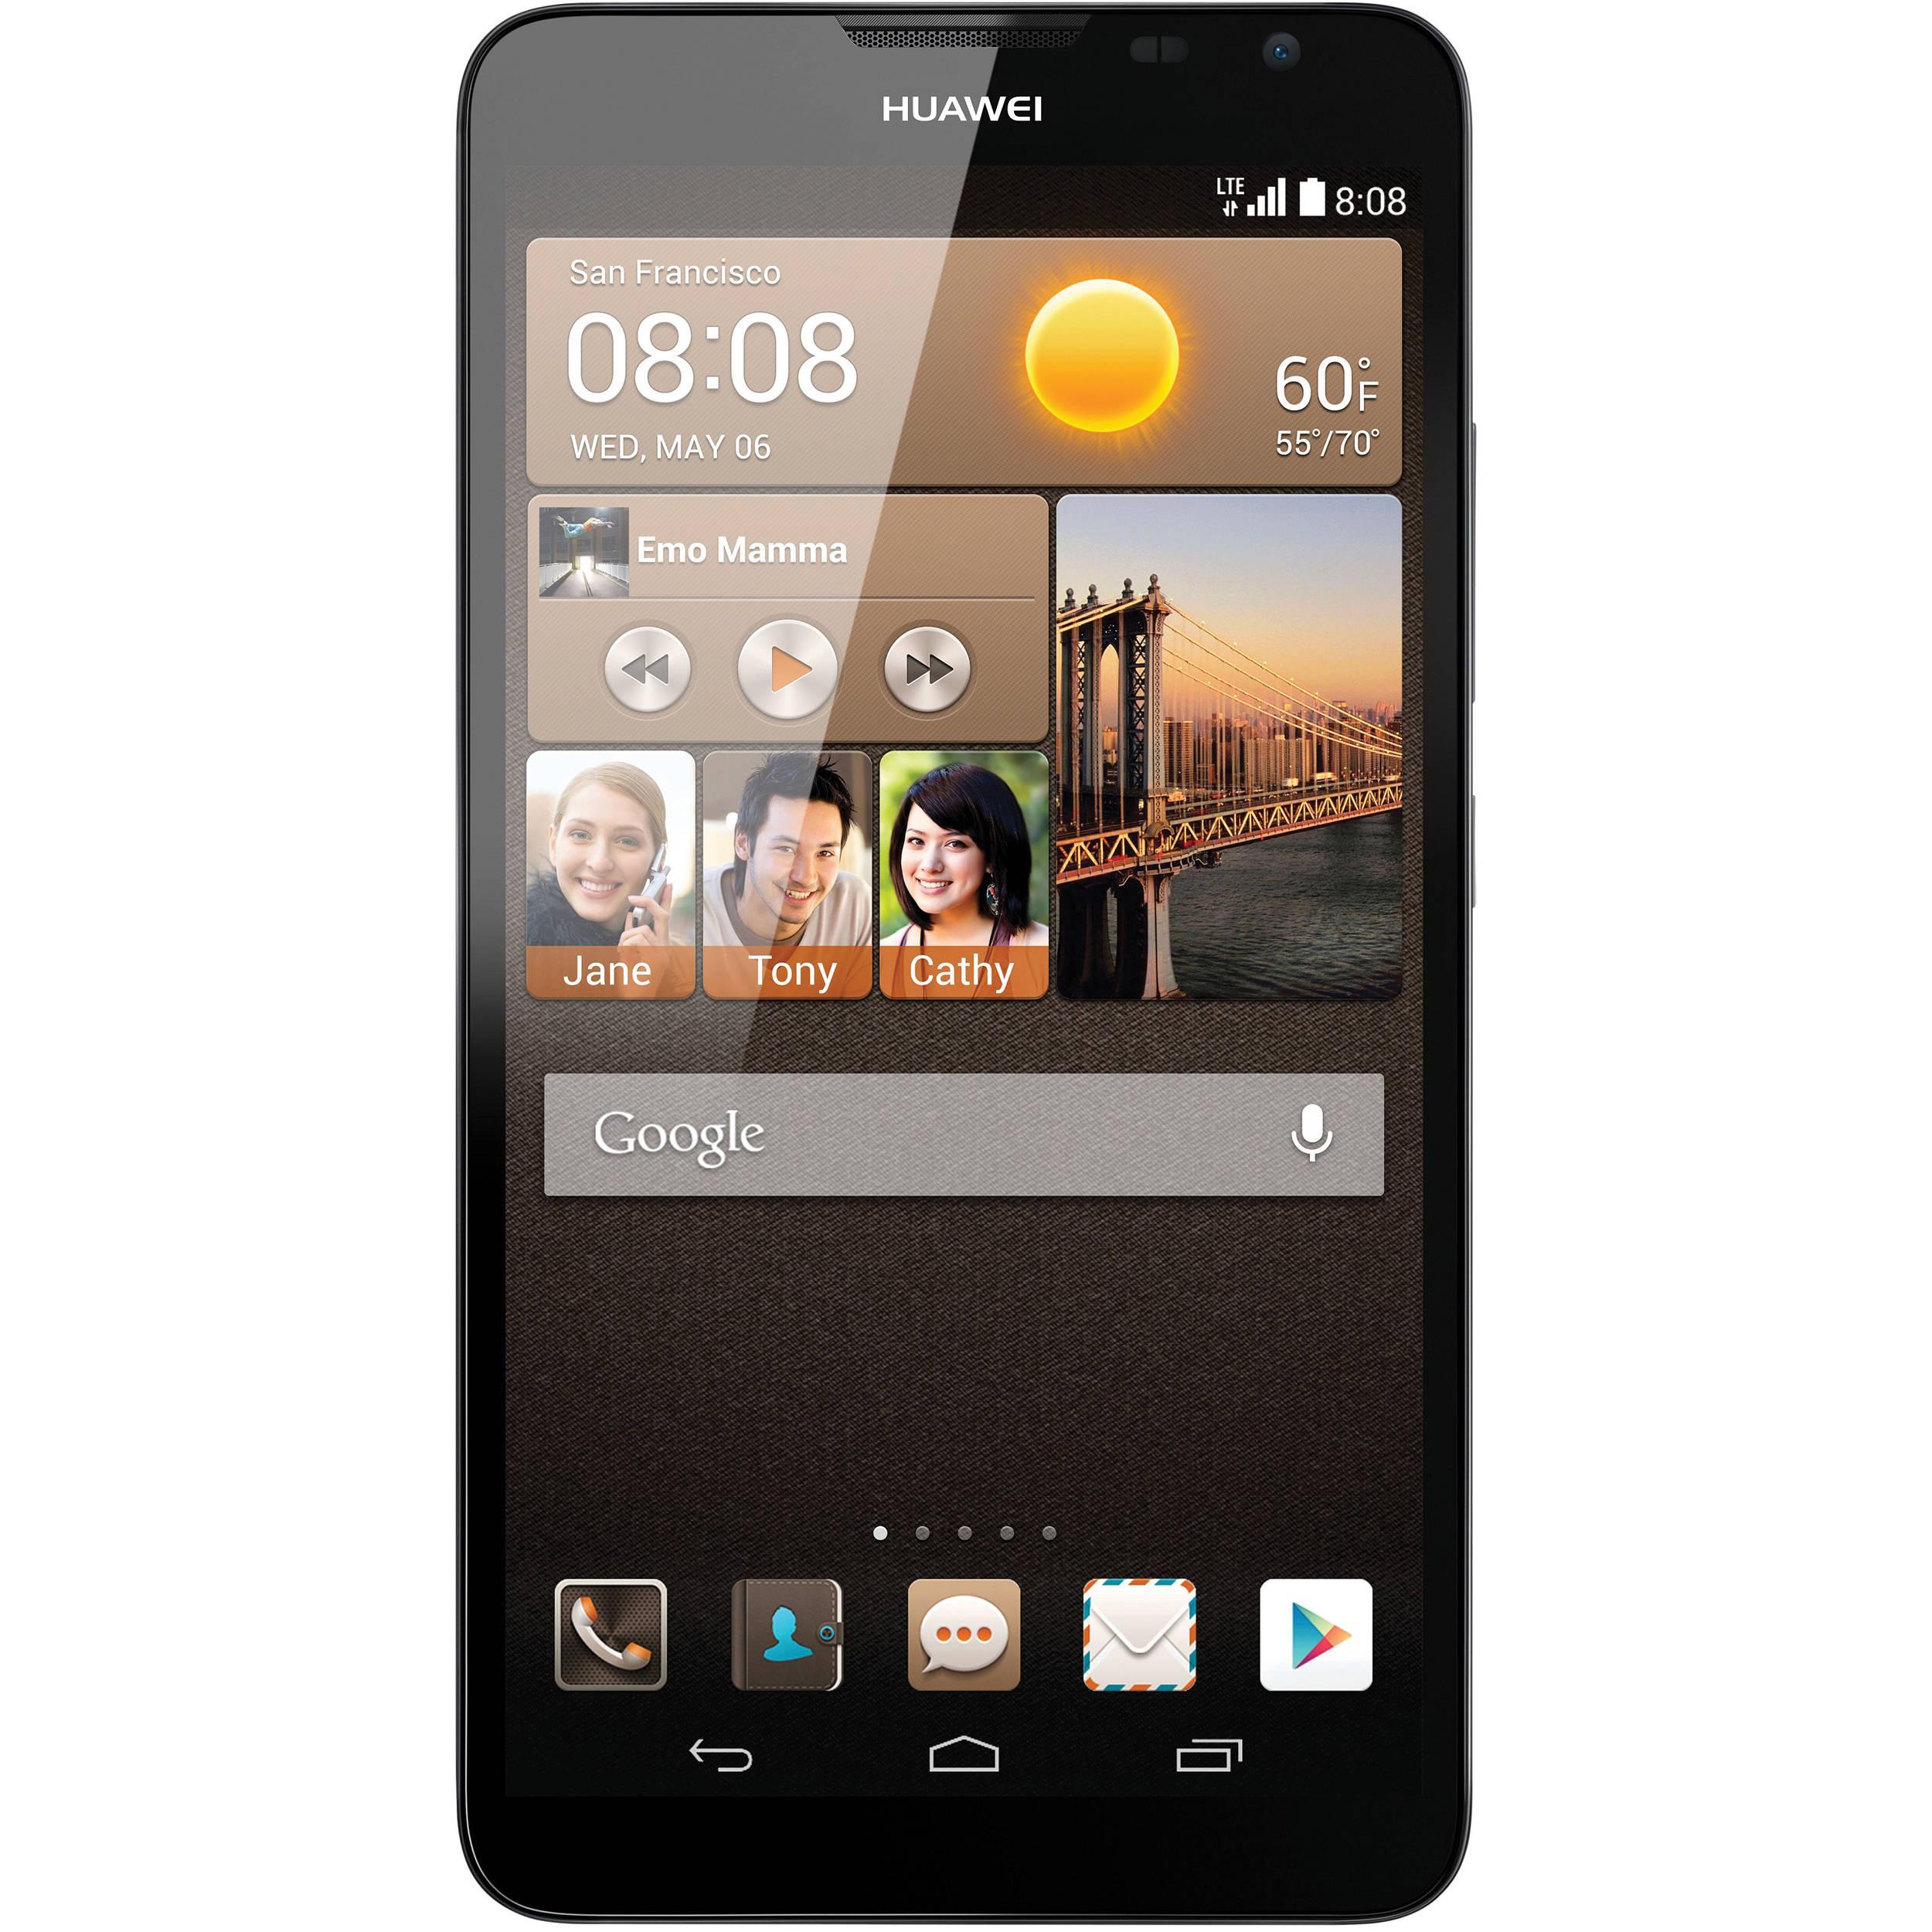 promo code 1f659 675fa Huawei Ascend Mate2 MT2-L03 4G 16GB Smartphone (Unlocked, Black)